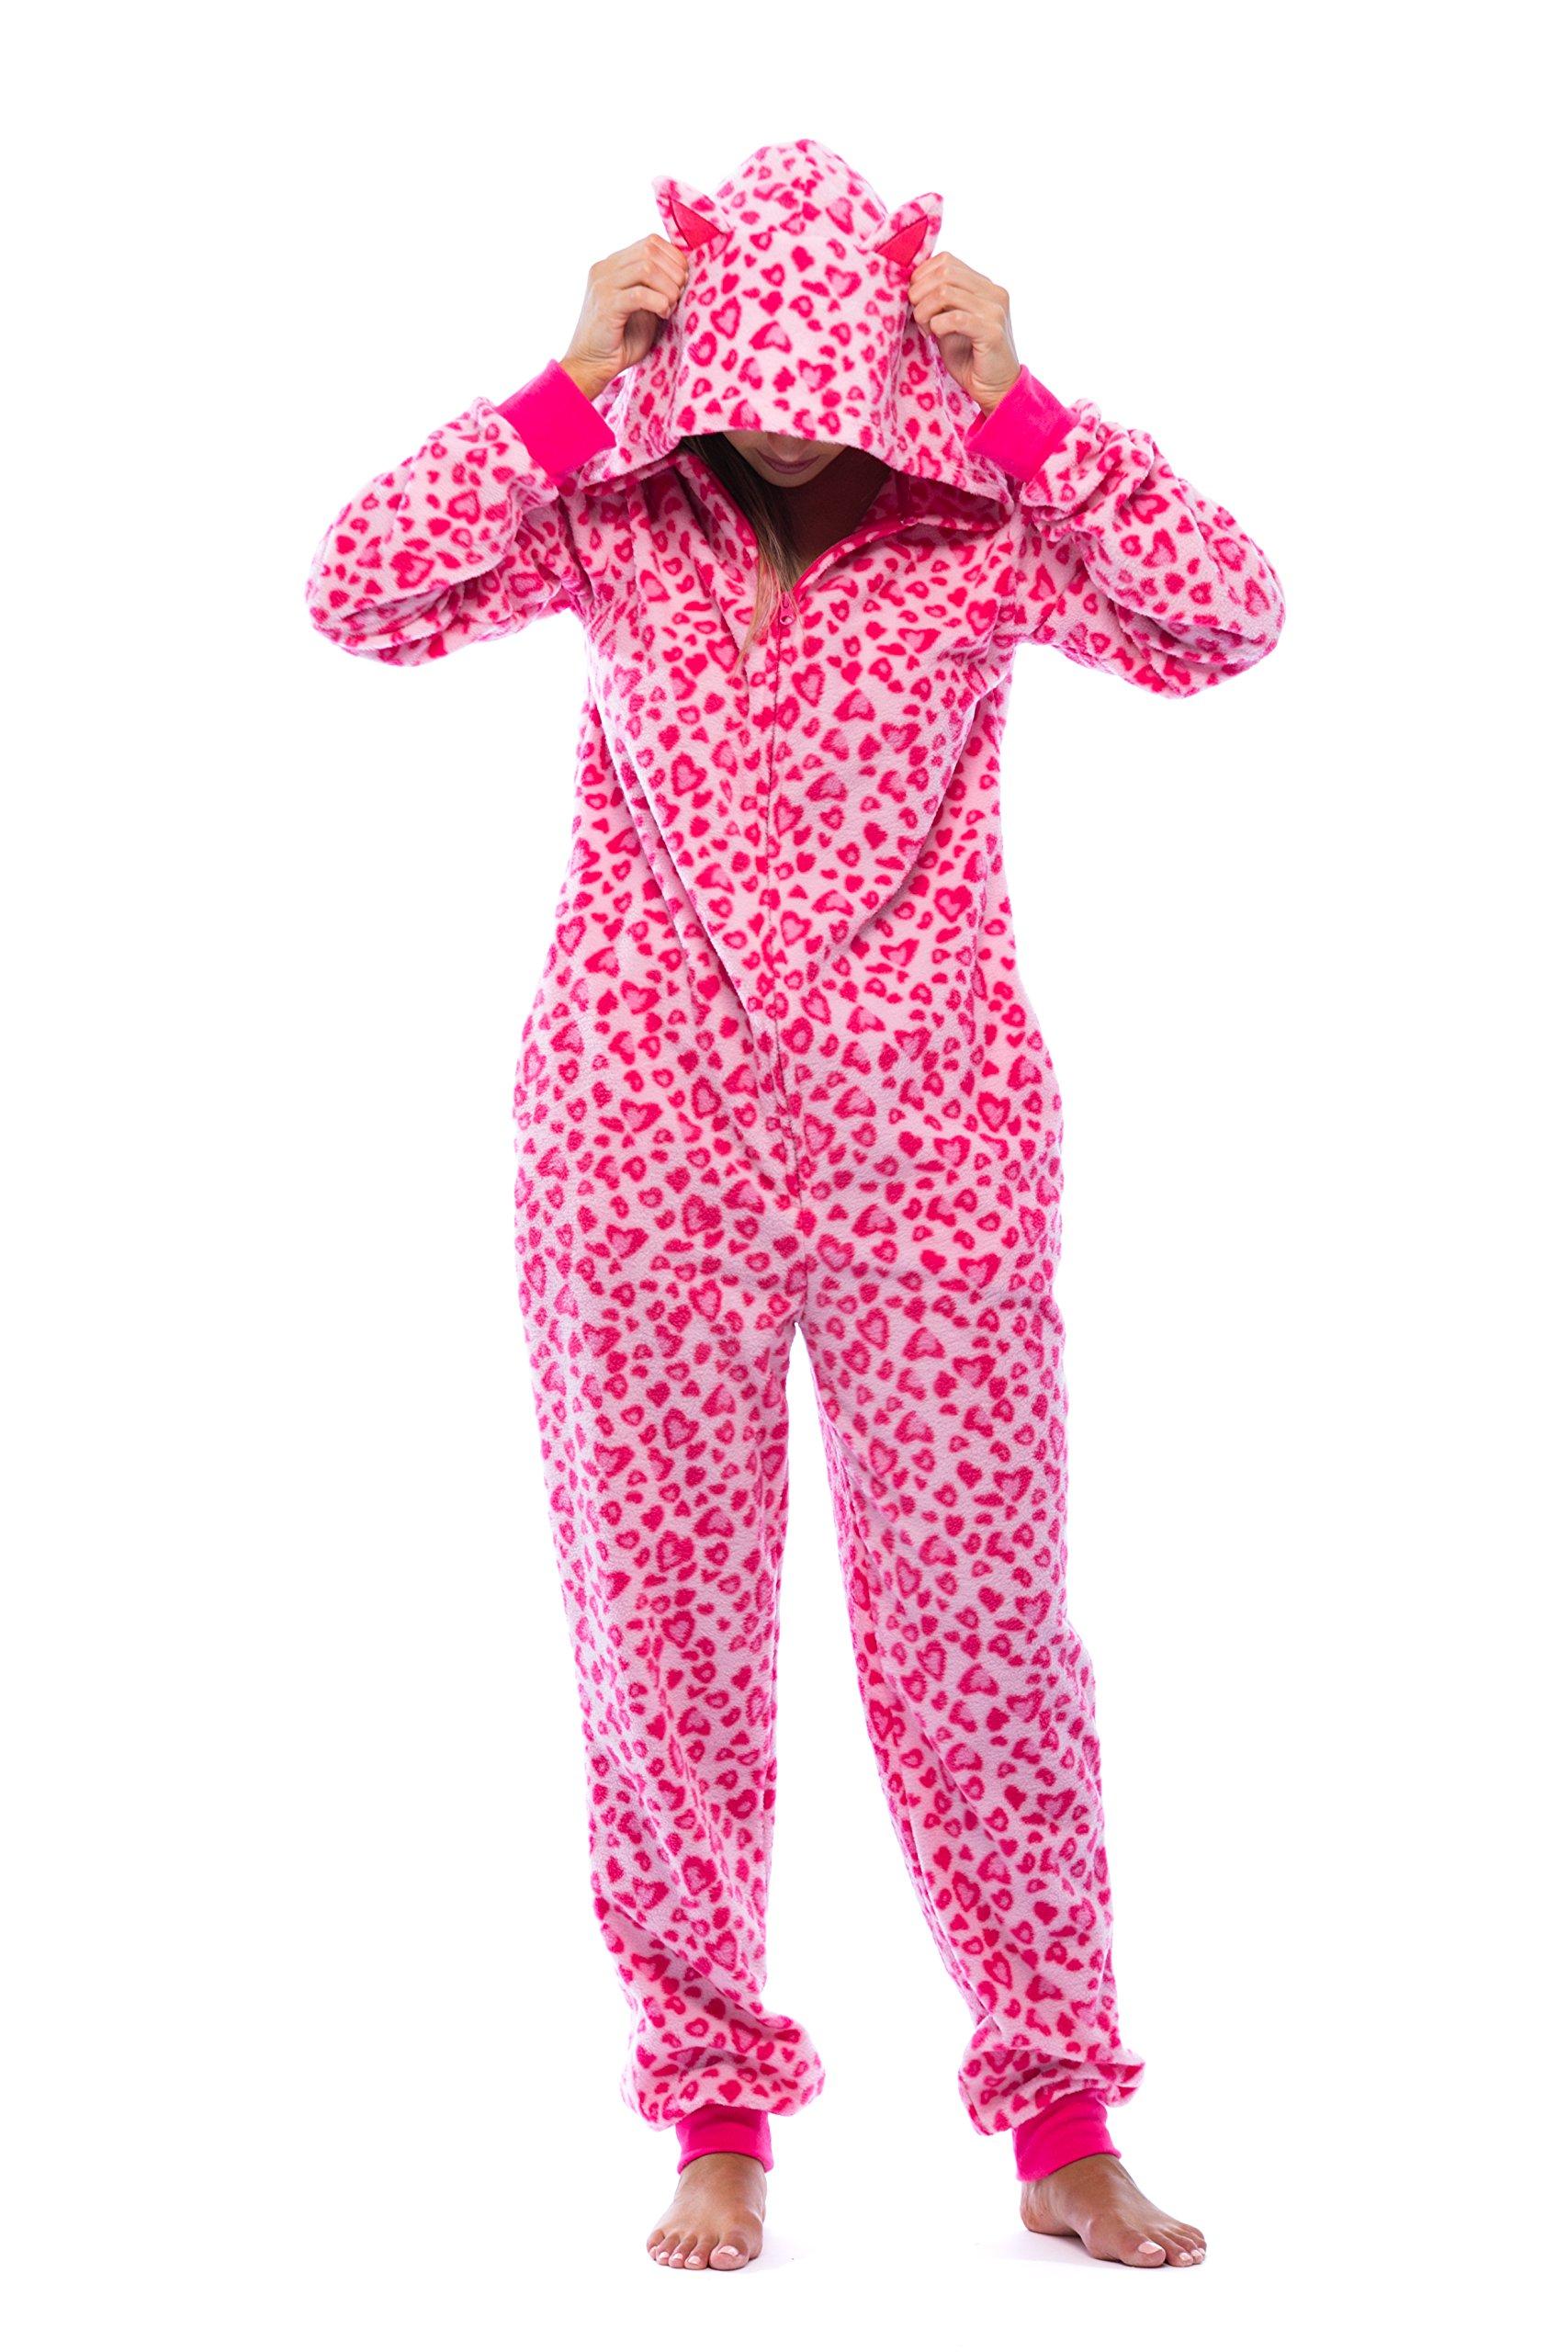 Just Love 6453-10215-M Adult Onesie With Animal Prints/Pajamas